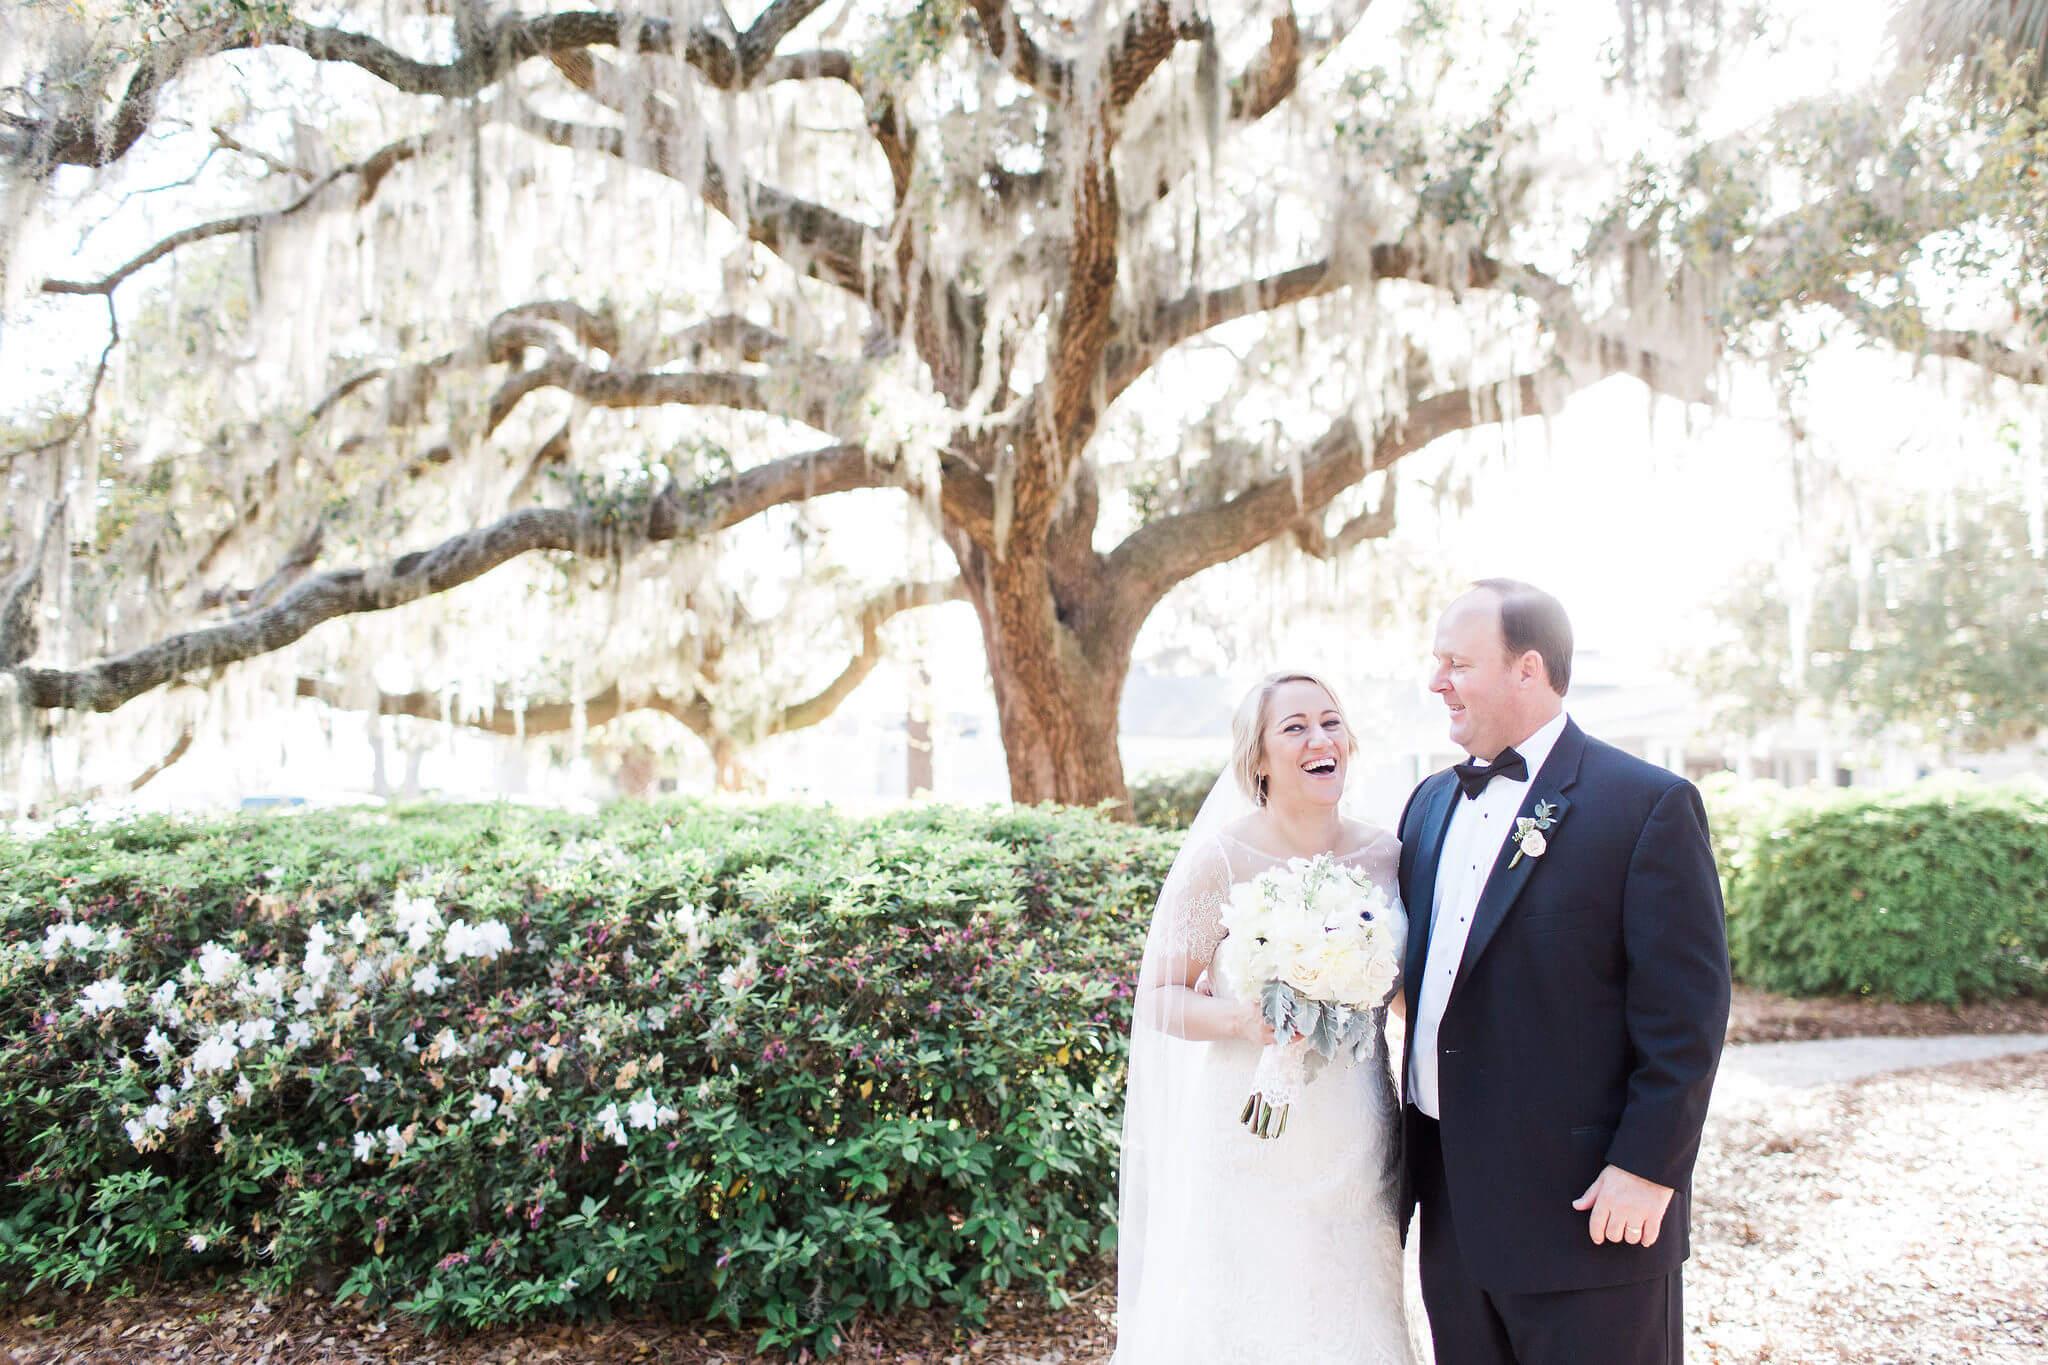 apt-b-photography-savannah-wedding-photographer-savannah-wedding-forsyth-park-elopement-intimate-wedding-photographer-22.JPG